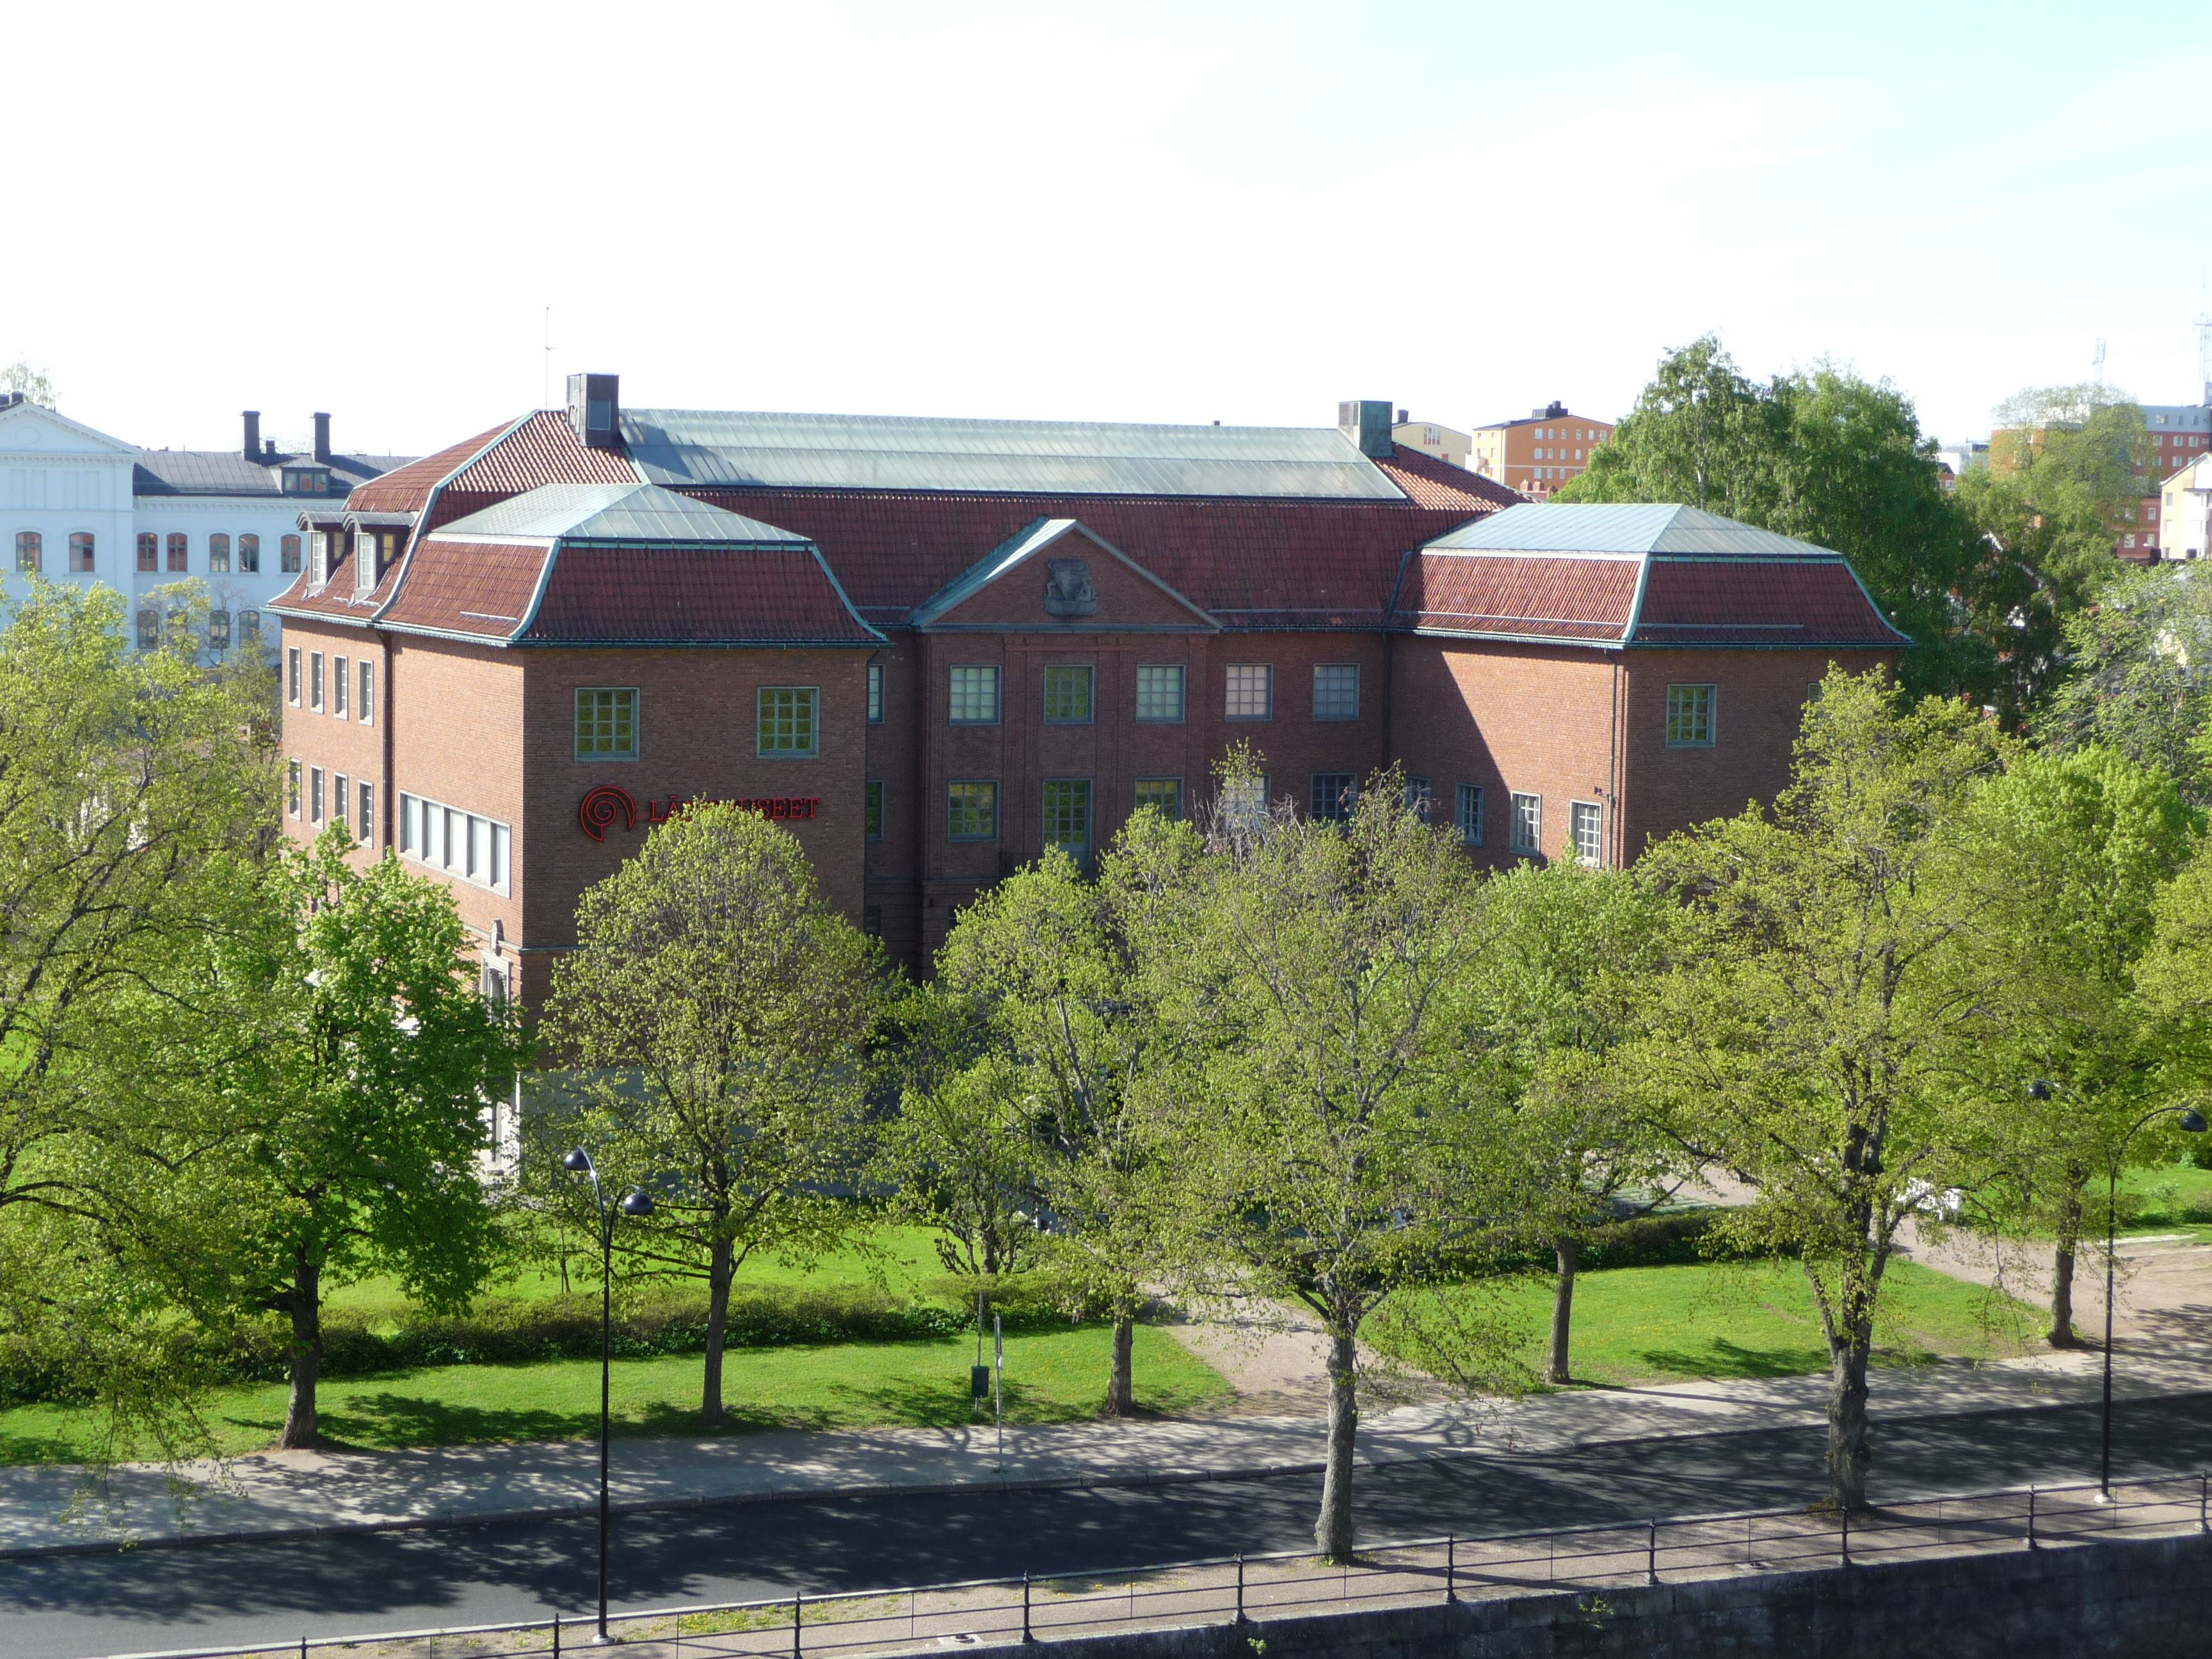 © Länsmuseet Gävleborg, The County Museum of Gävleborg